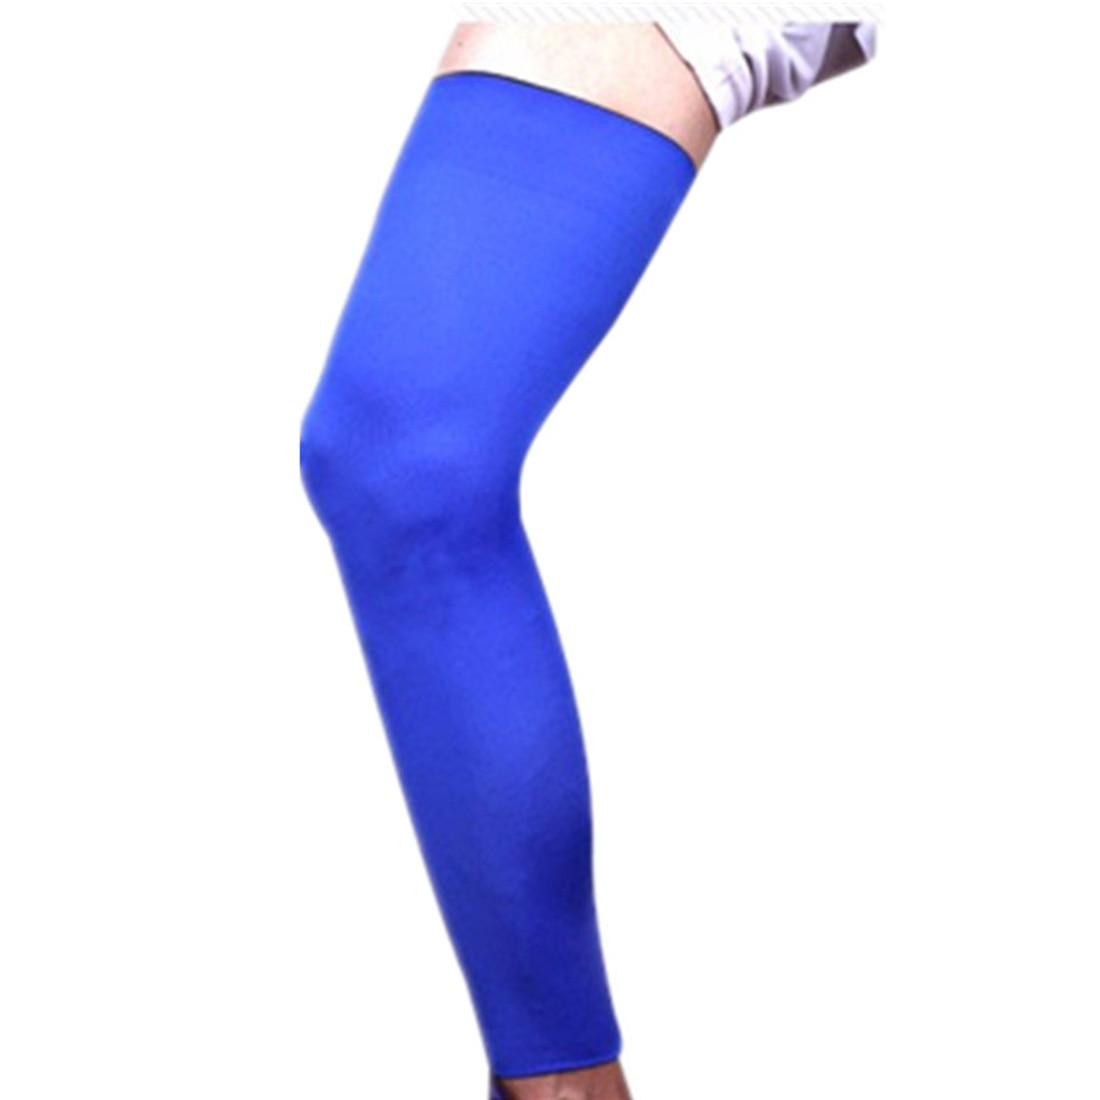 1Pc Knitted Basketball Cycling Men Women Leg Warmers Elastic Stretch High Socks Skinny Stockings Sports Leg Sleeve Blue